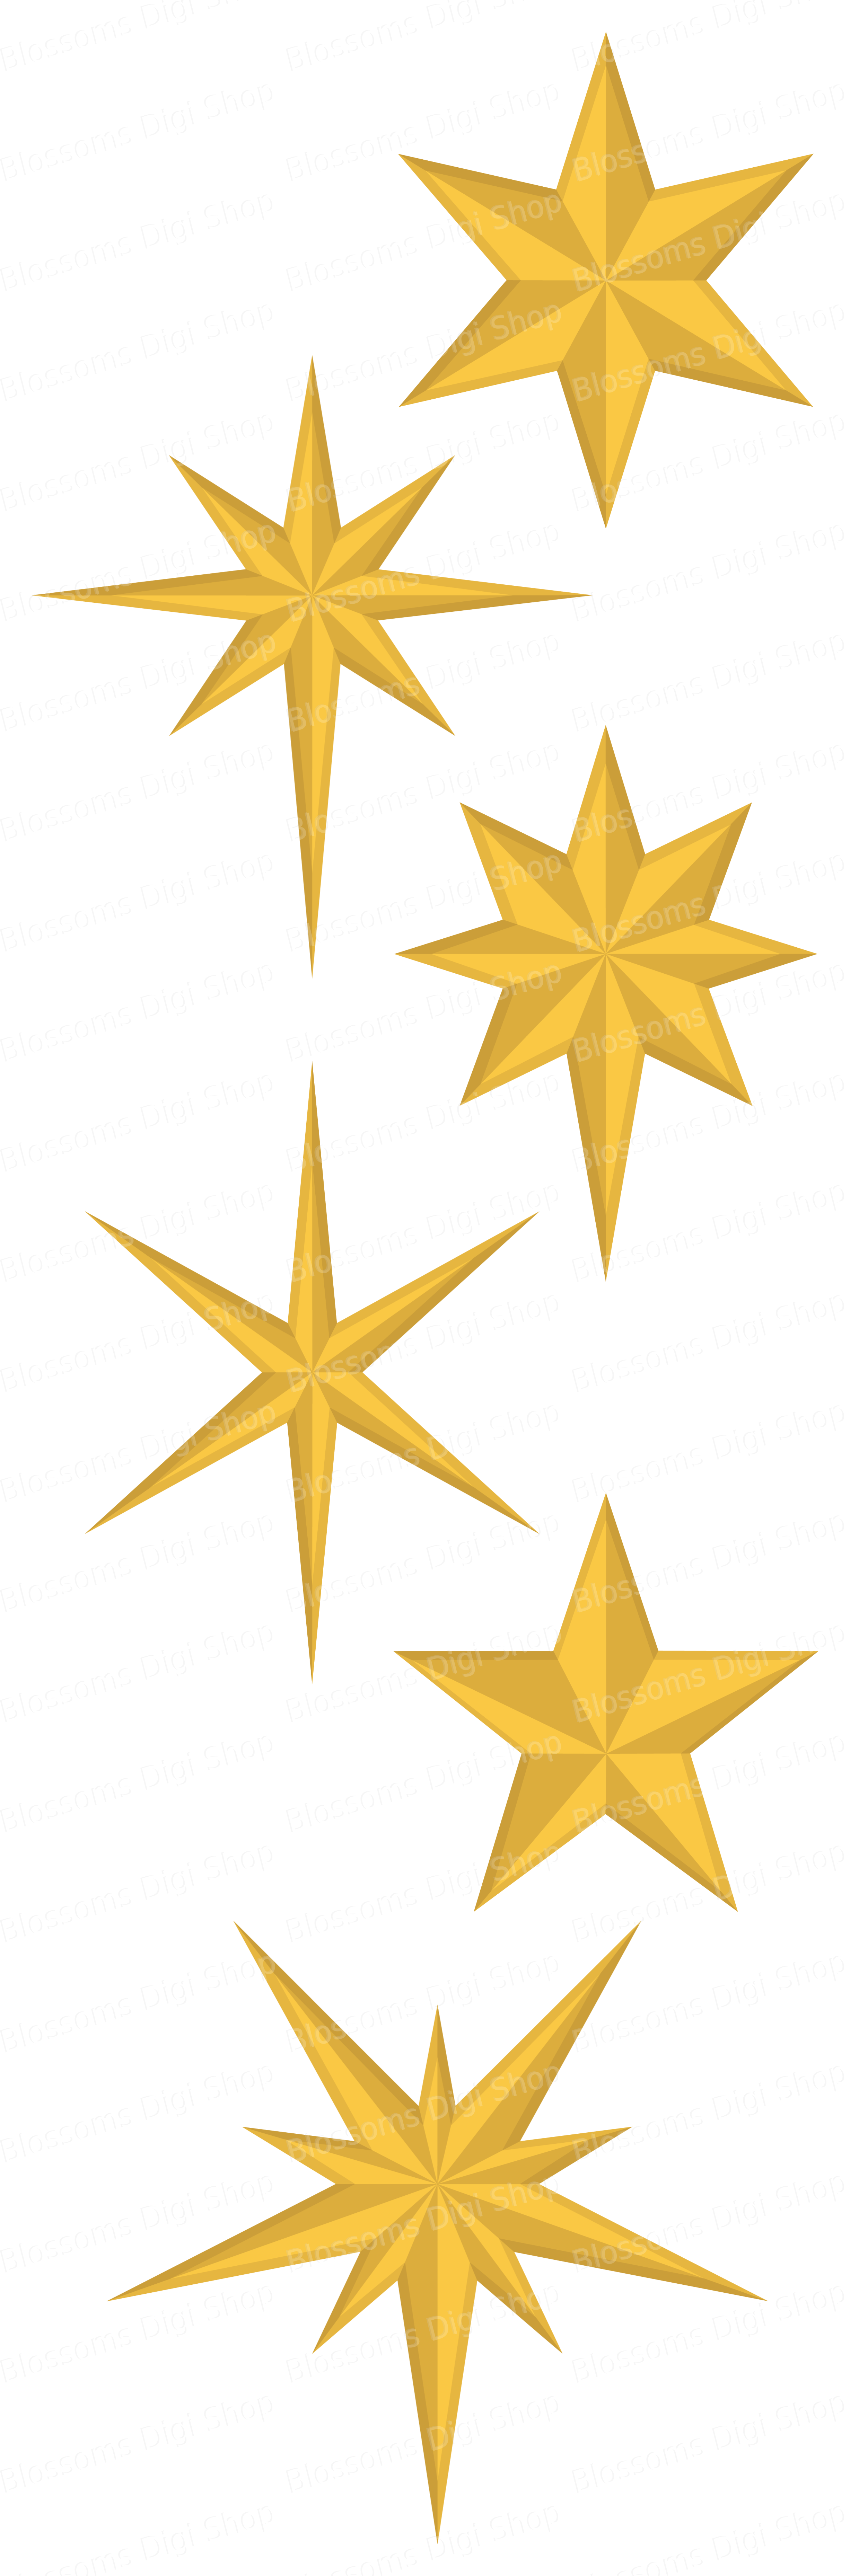 Christmas stars clipart, gold star clipart, star elements, star.